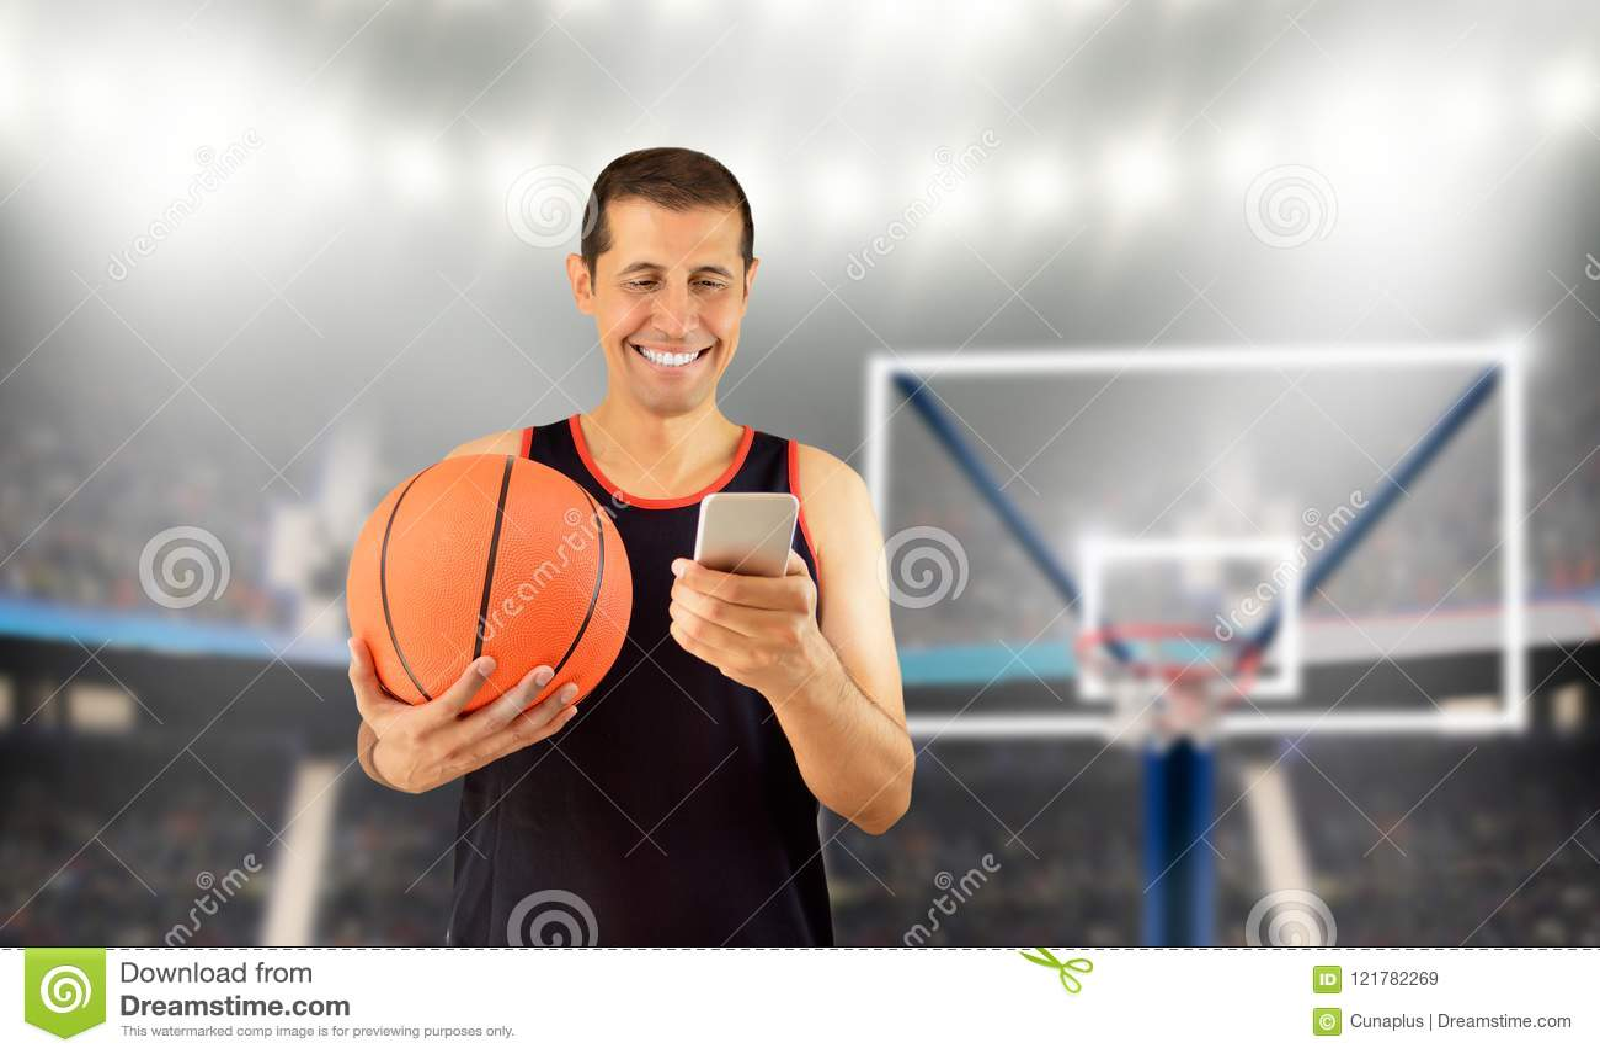 Arenabetting basketball stan james betting advert